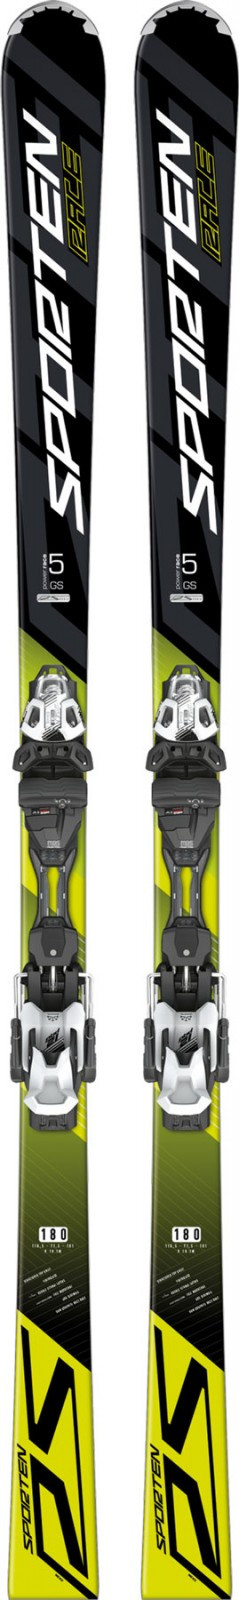 Sporten RS 5 GS + PRD 12